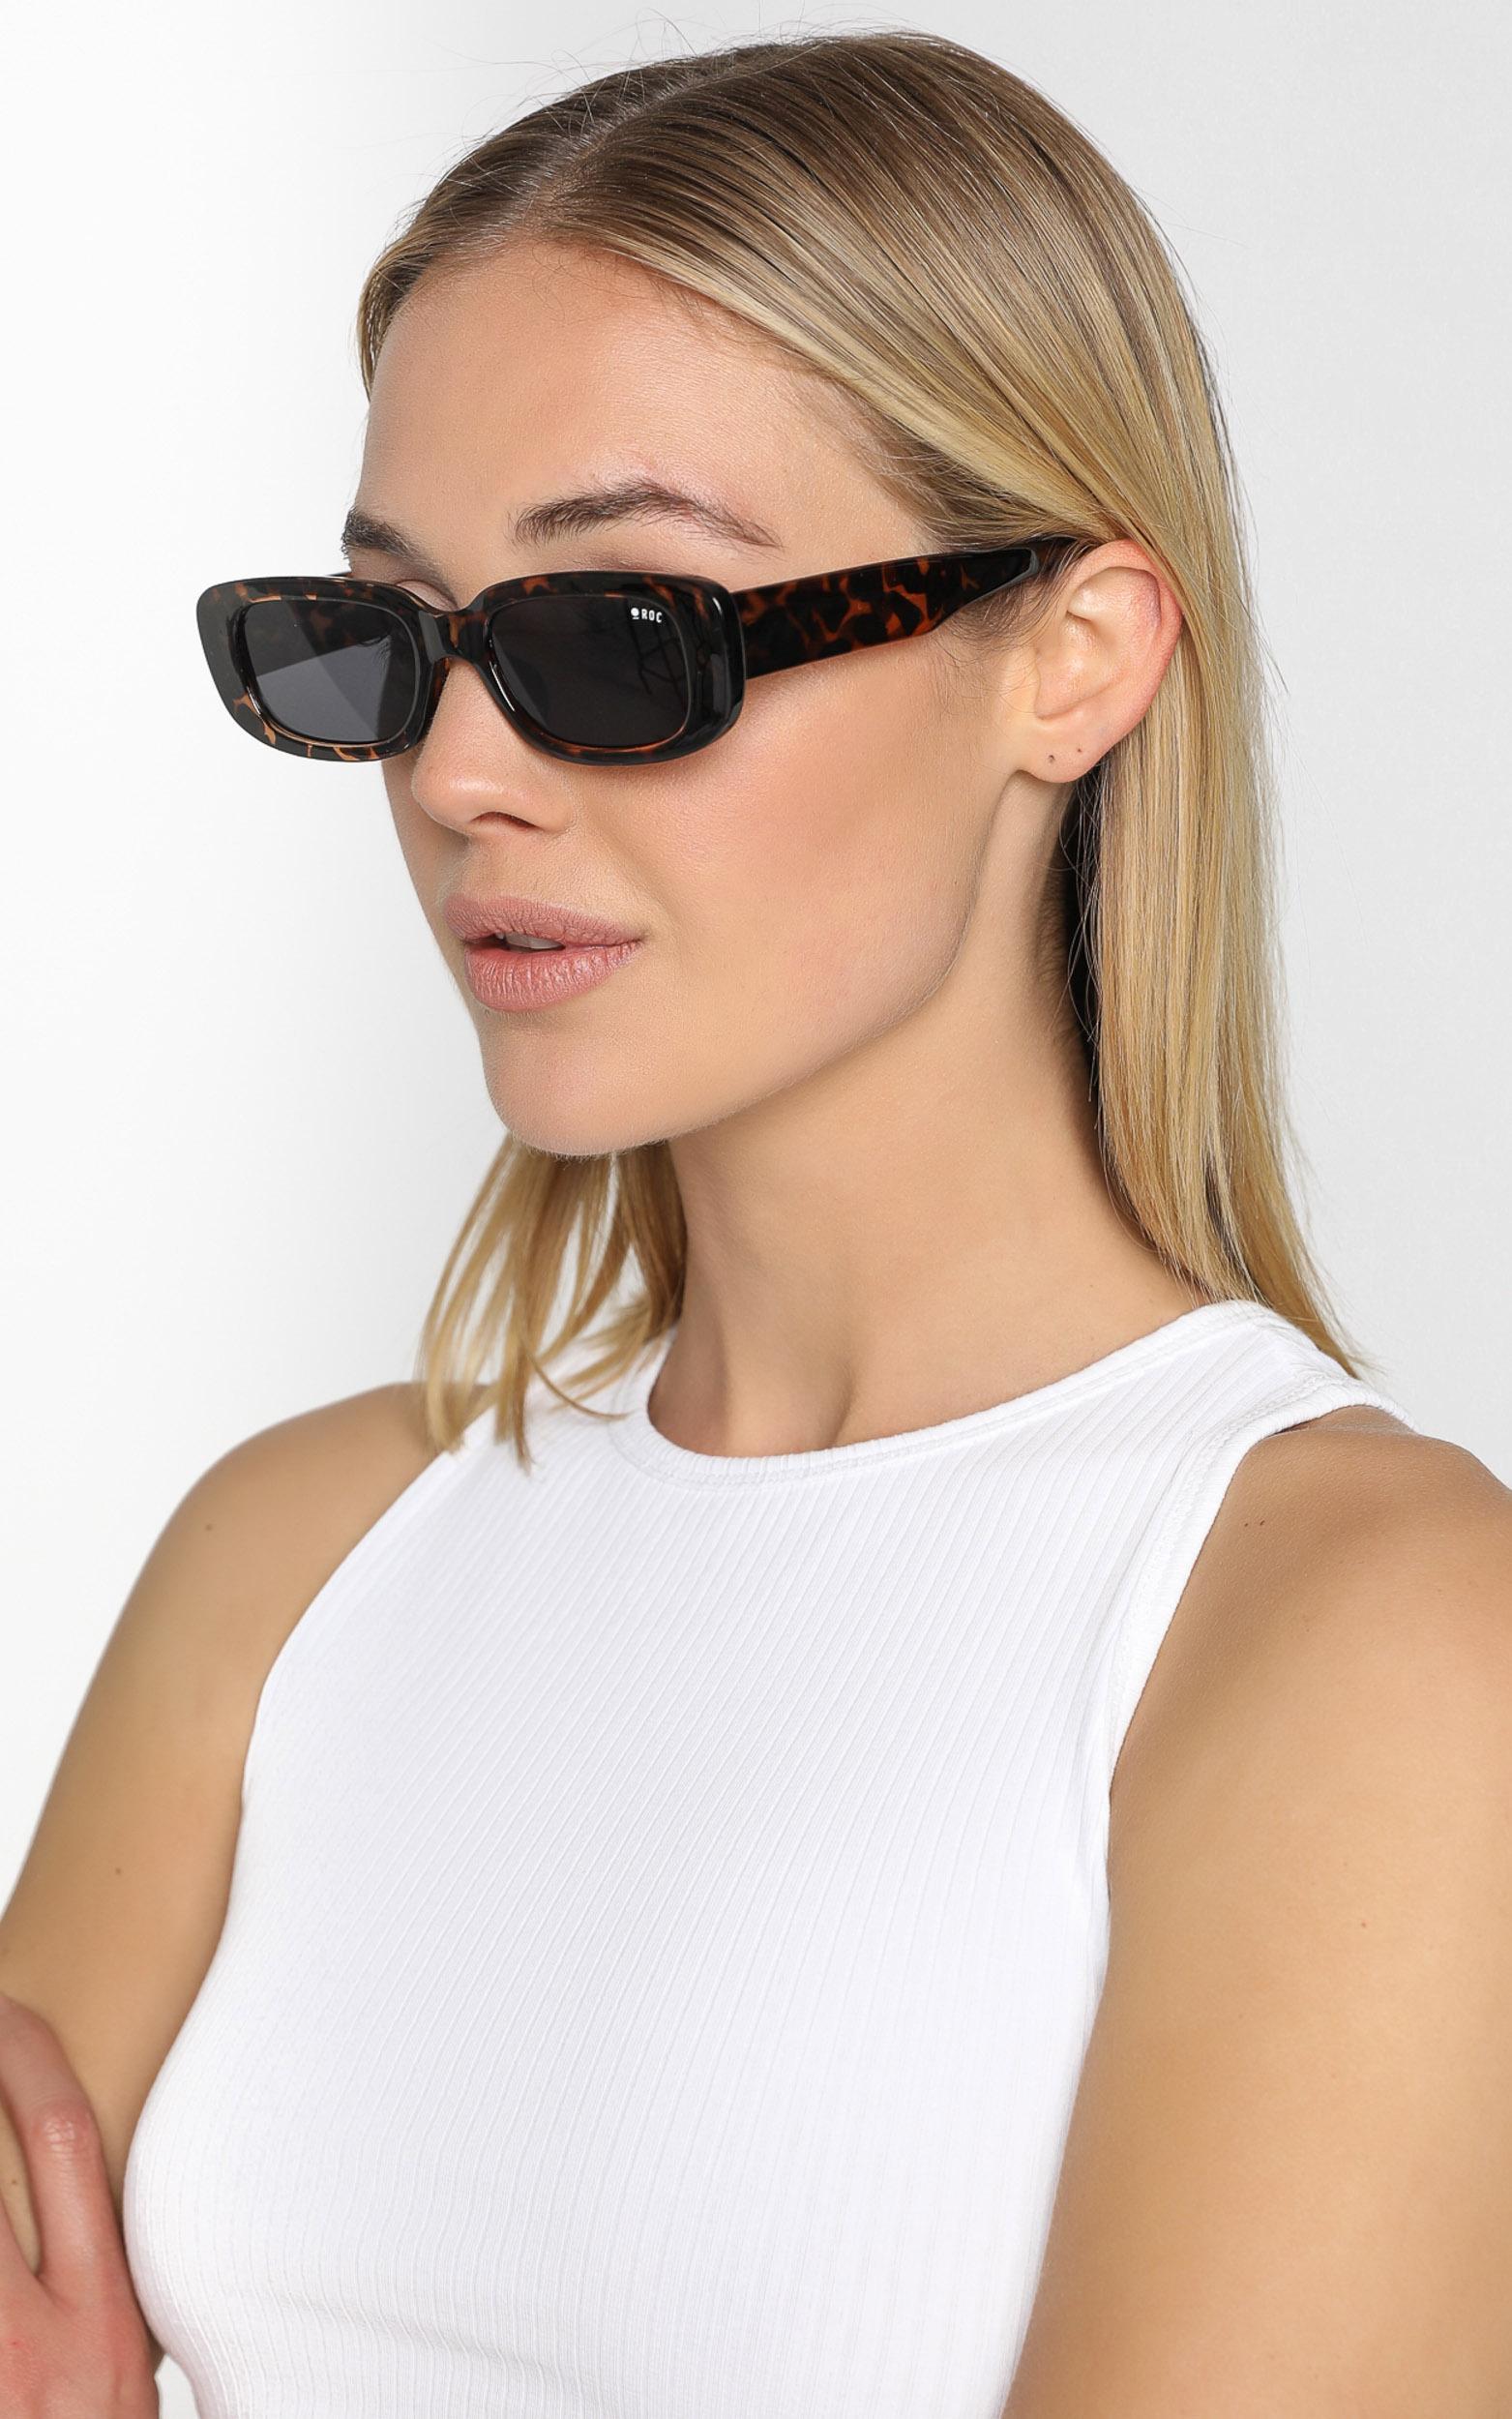 Roc - Creeper Sunglasses in Tortoiseshell, , hi-res image number null